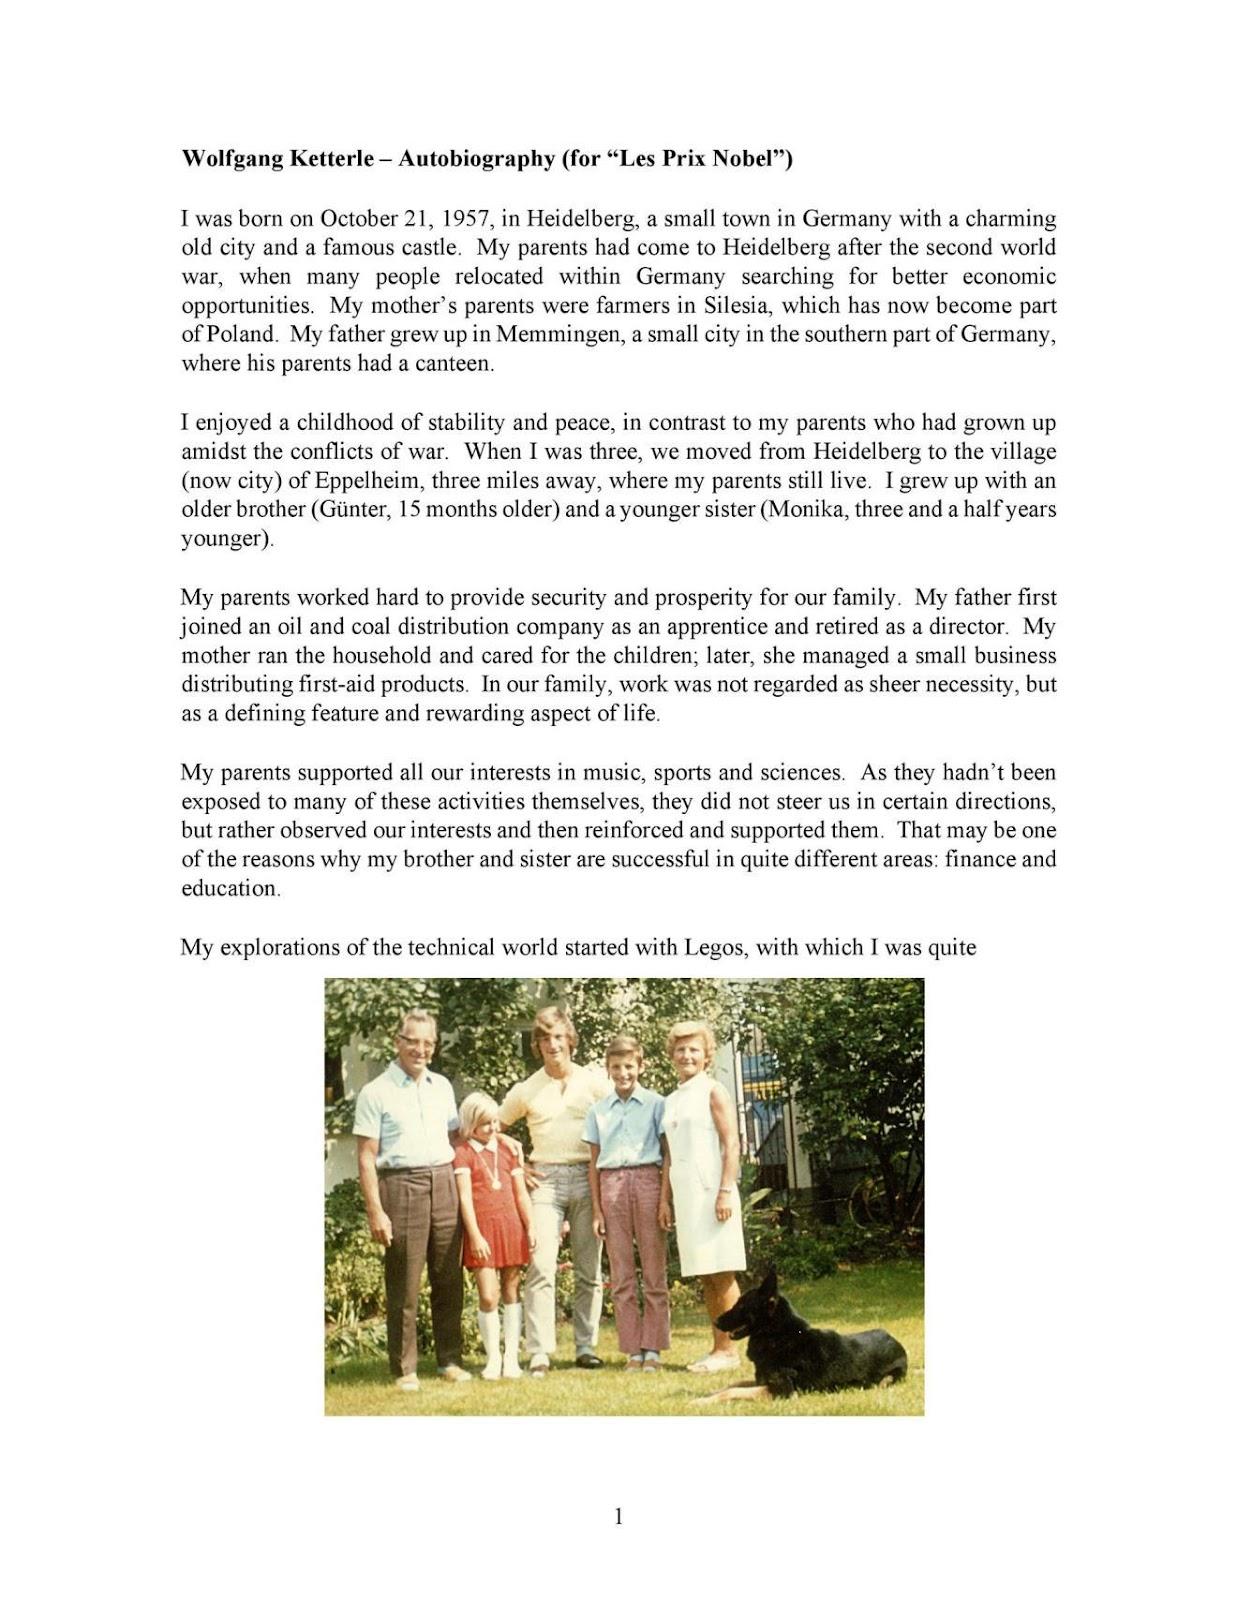 Autobiography-Template-34.jpg